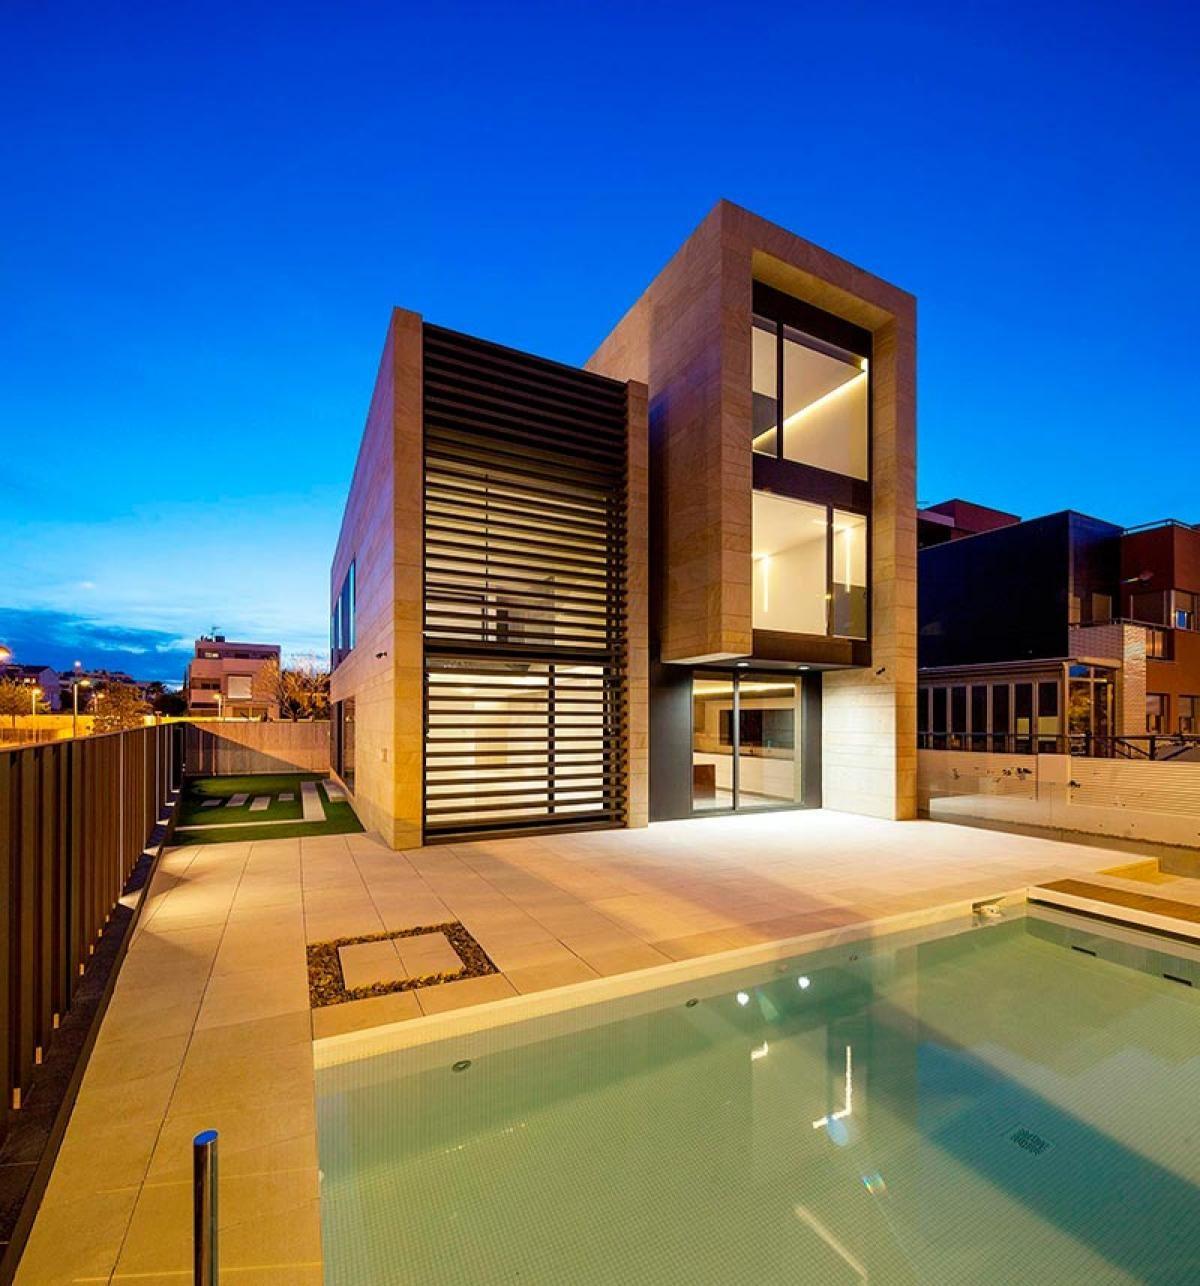 Arquitectura moderna vs arquitectura contempor nea for Tendencia minimalista arquitectura